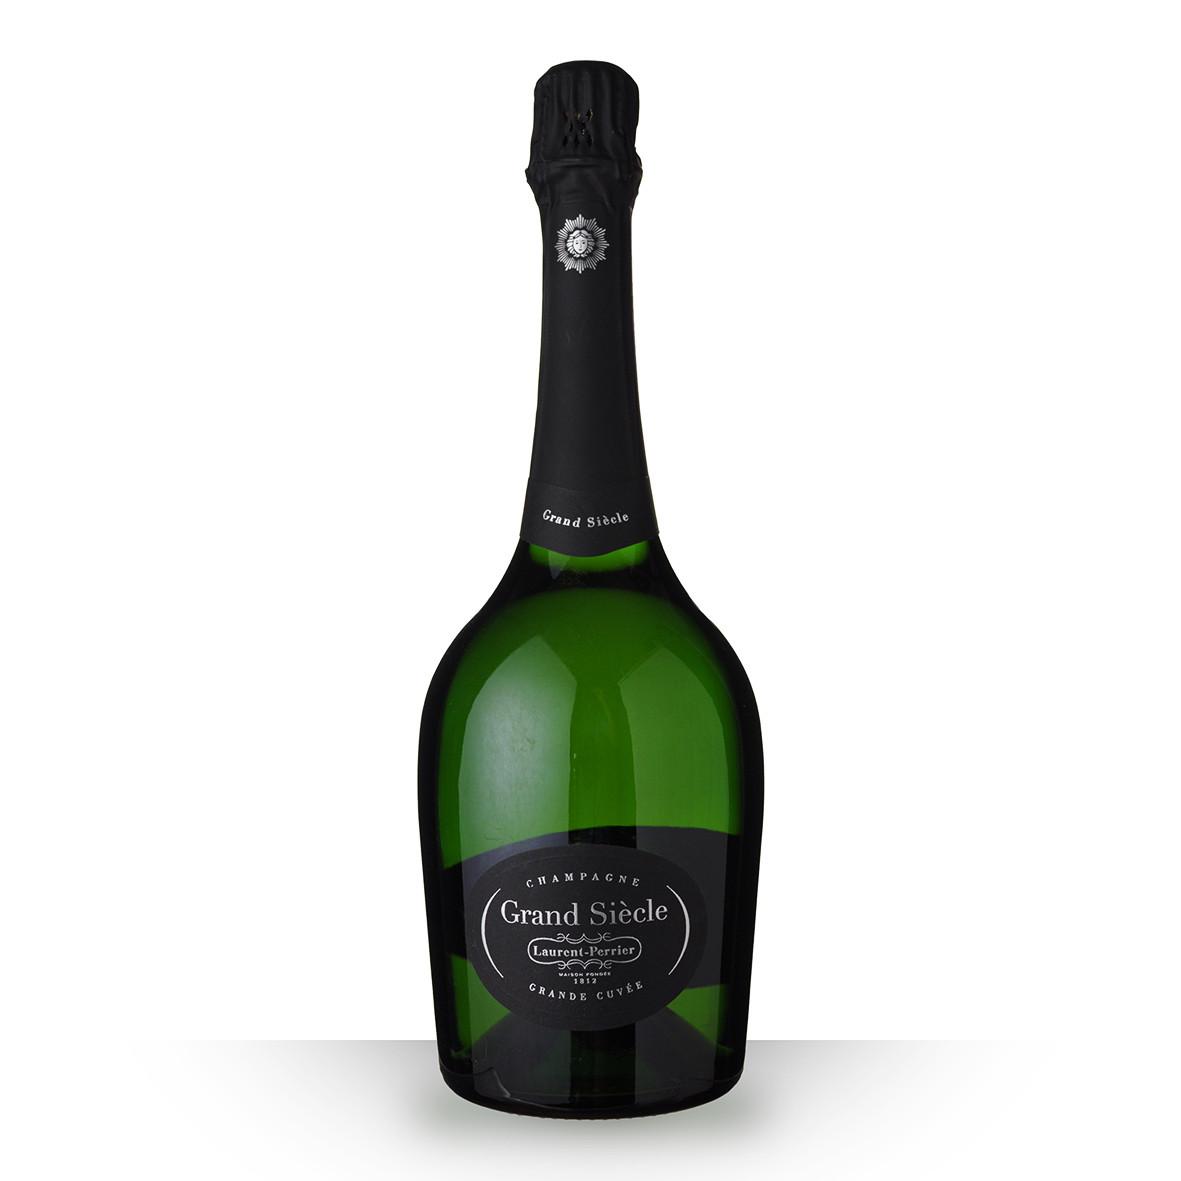 Champagne Laurent-Perrier Grand Siècle Brut 75cl www.odyssee-vins.com